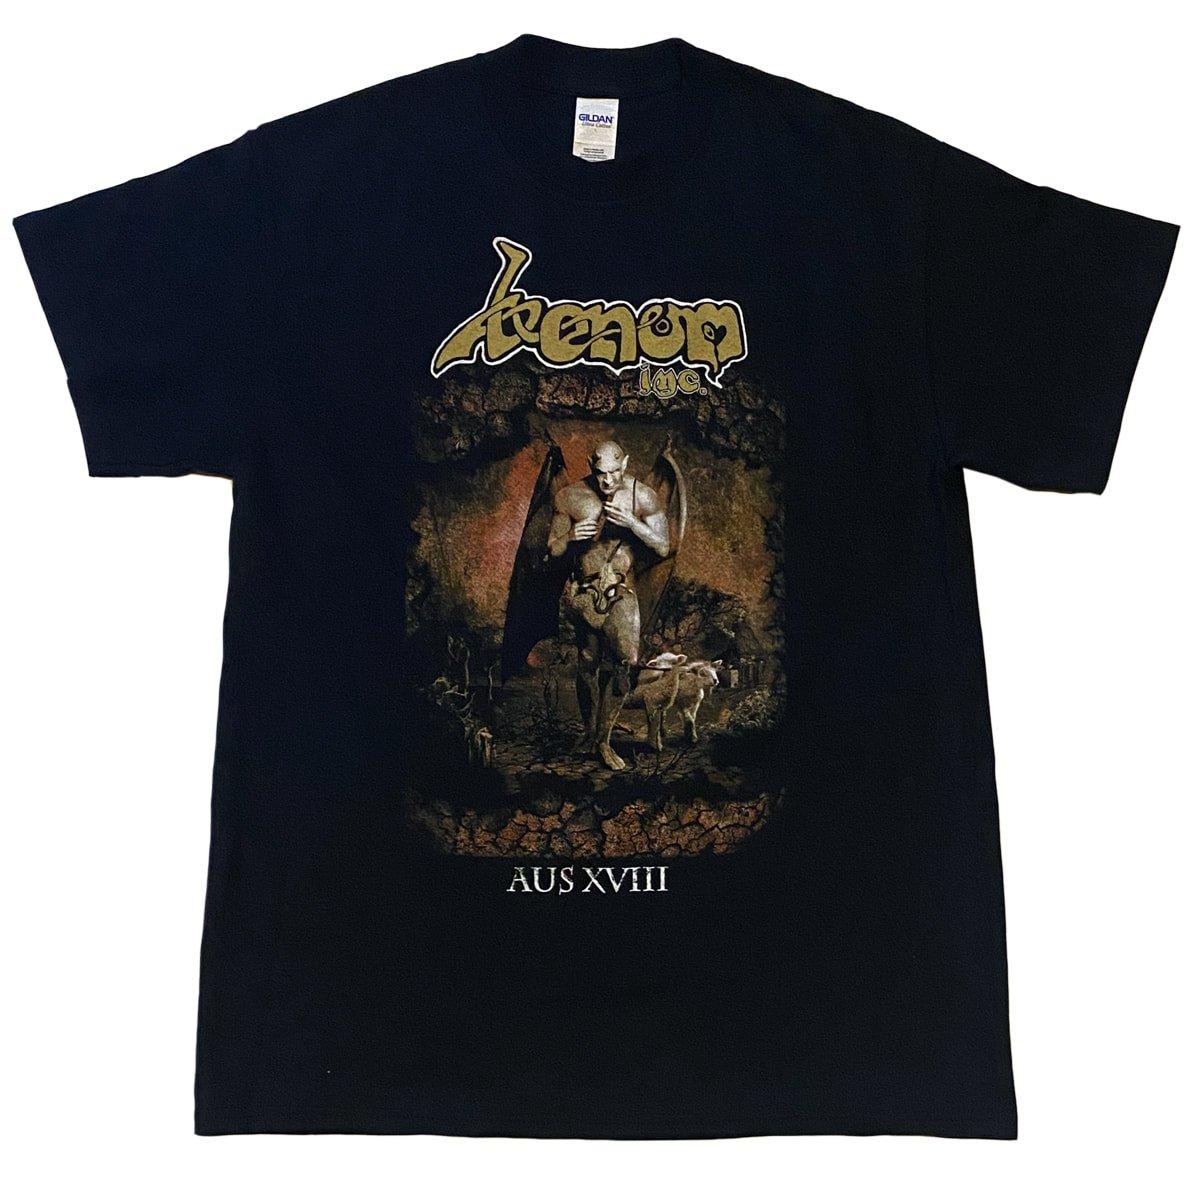 Image of VENOM INC - Ave Australis - Aussie Tour Shirt/Dates on Back